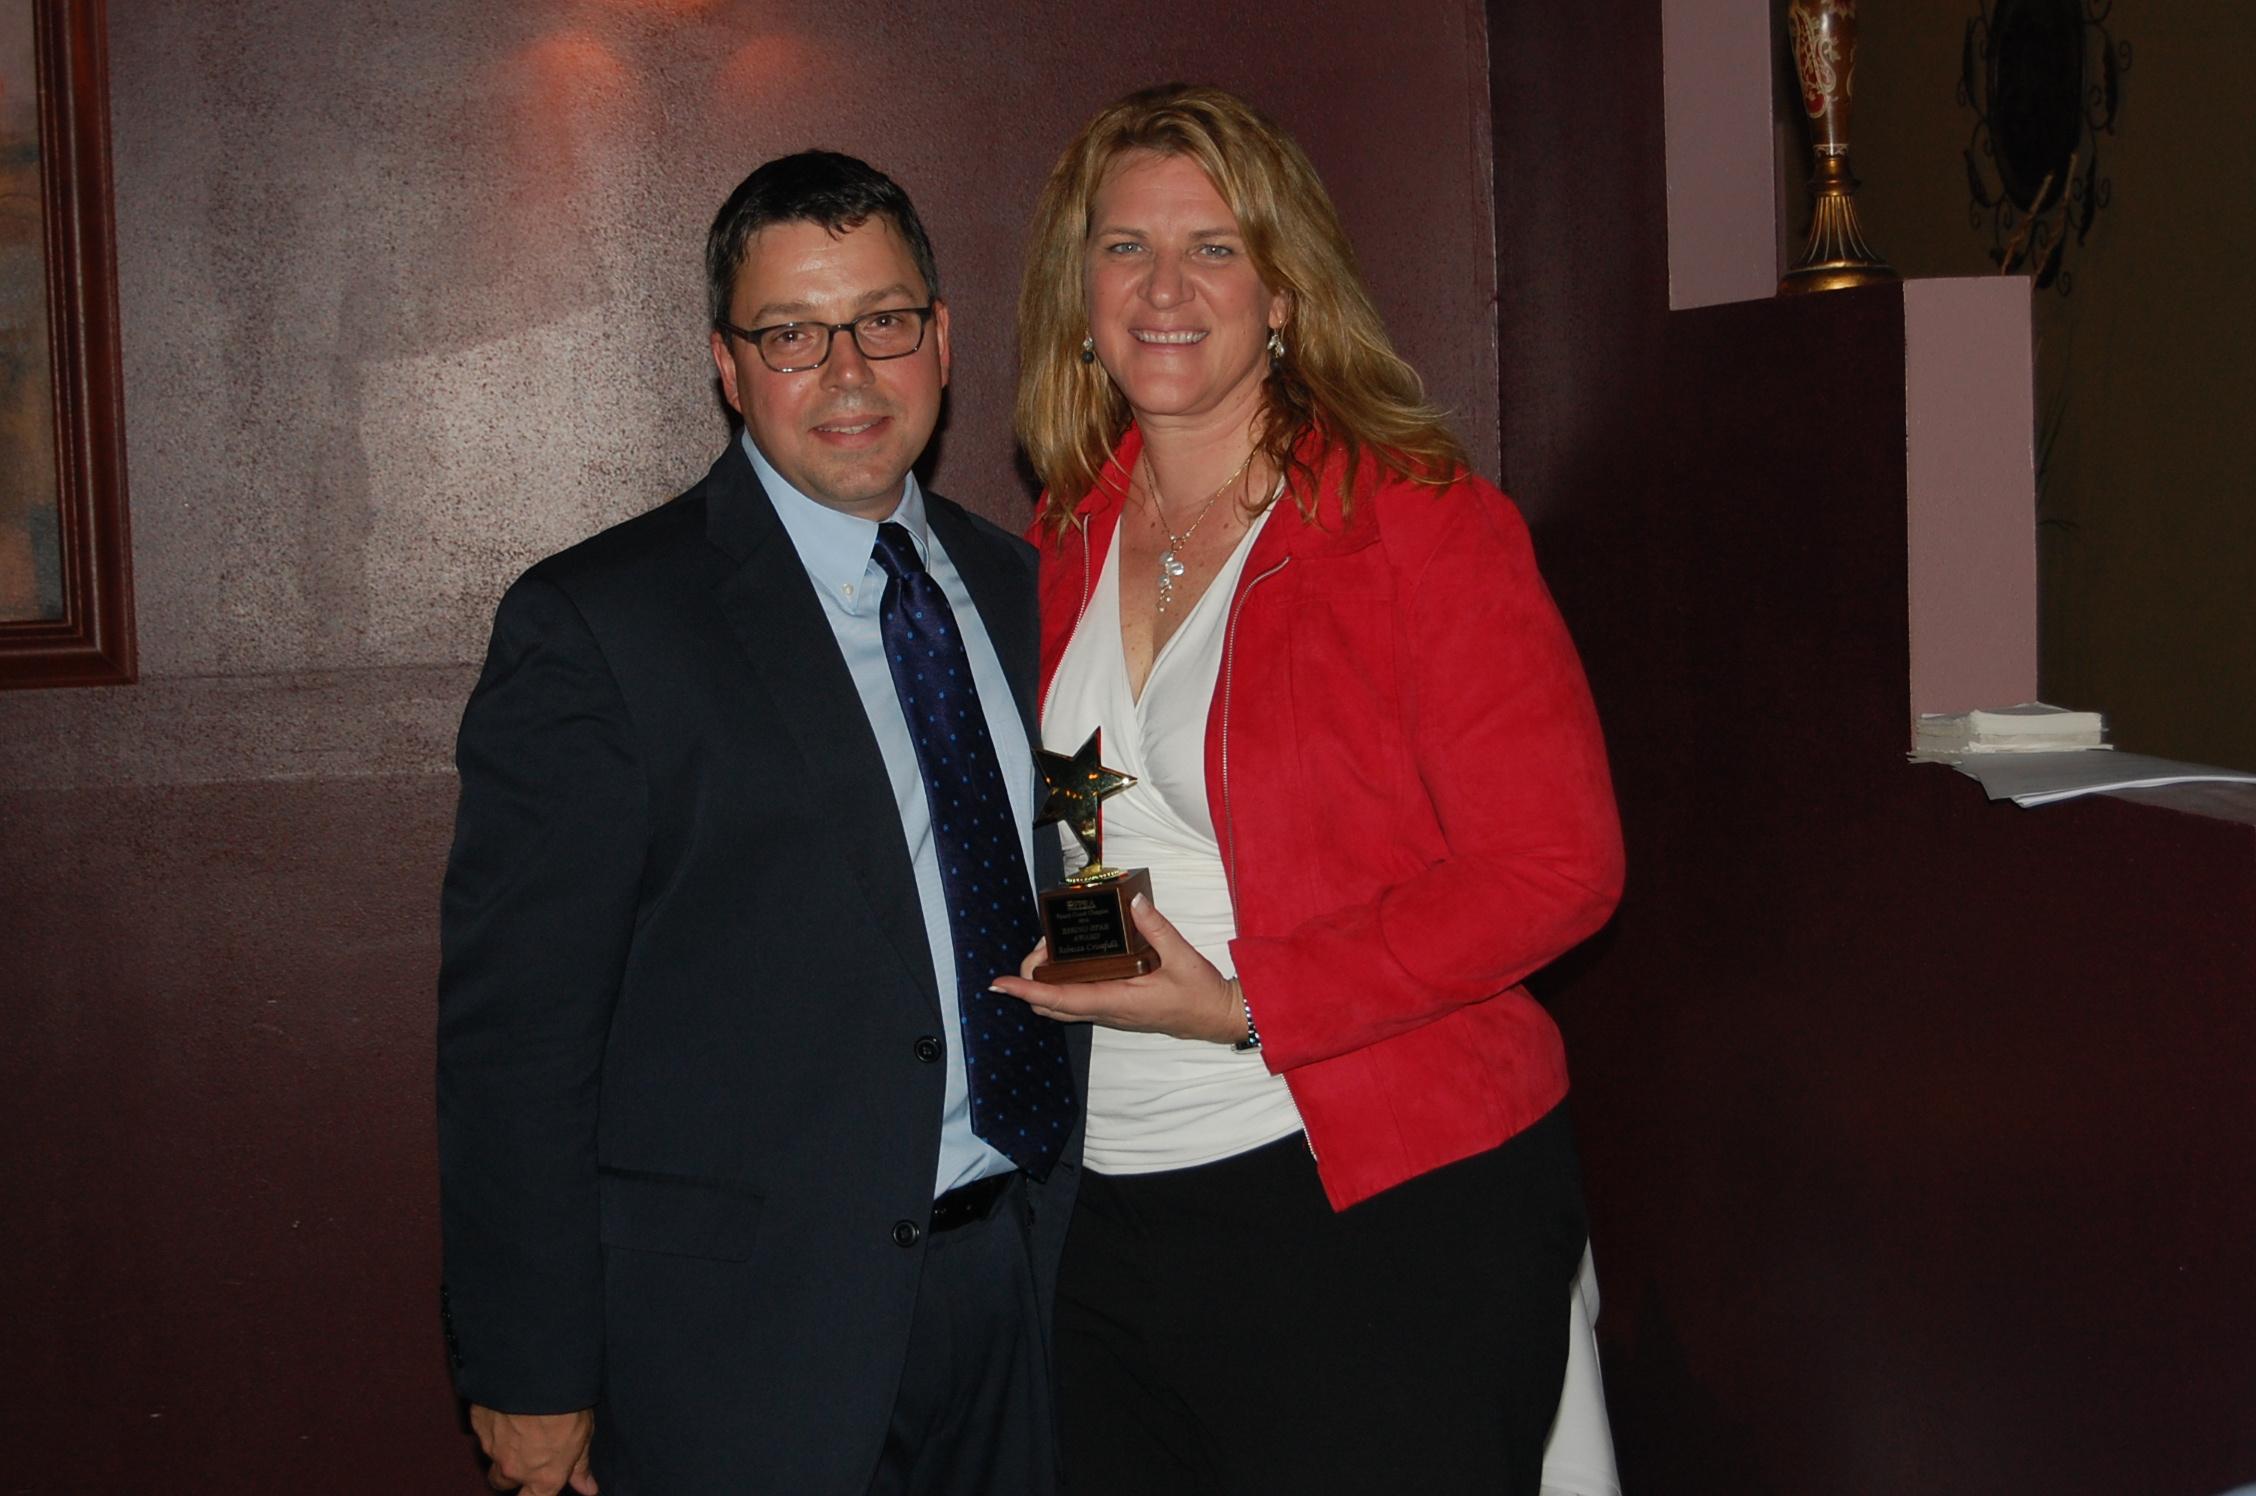 DSC_0058 Rebecca Crisafulli - Rising Star Award and Michael Gardner, APR